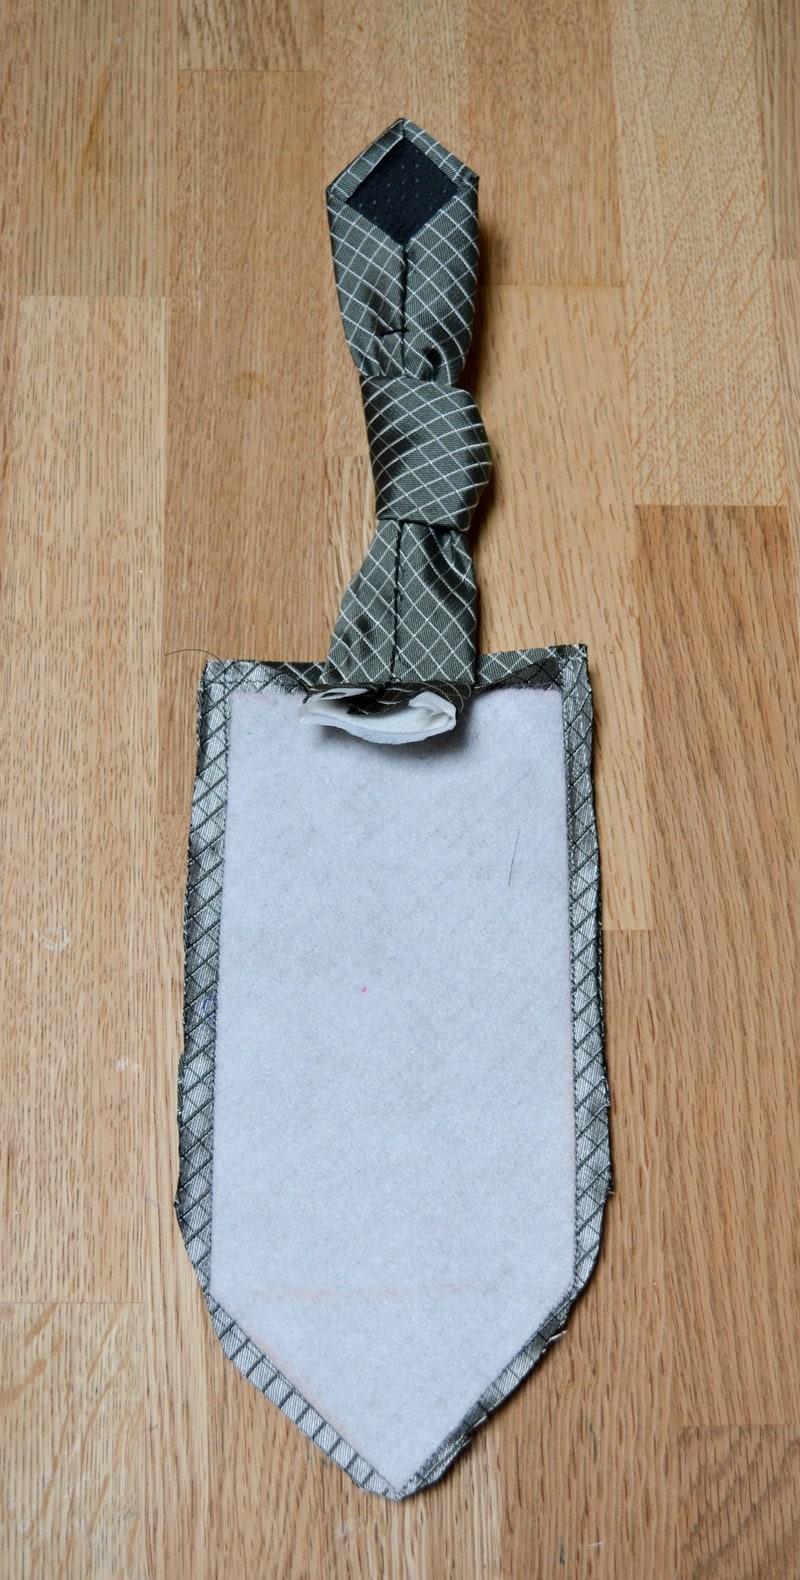 phone holder tie piecing together